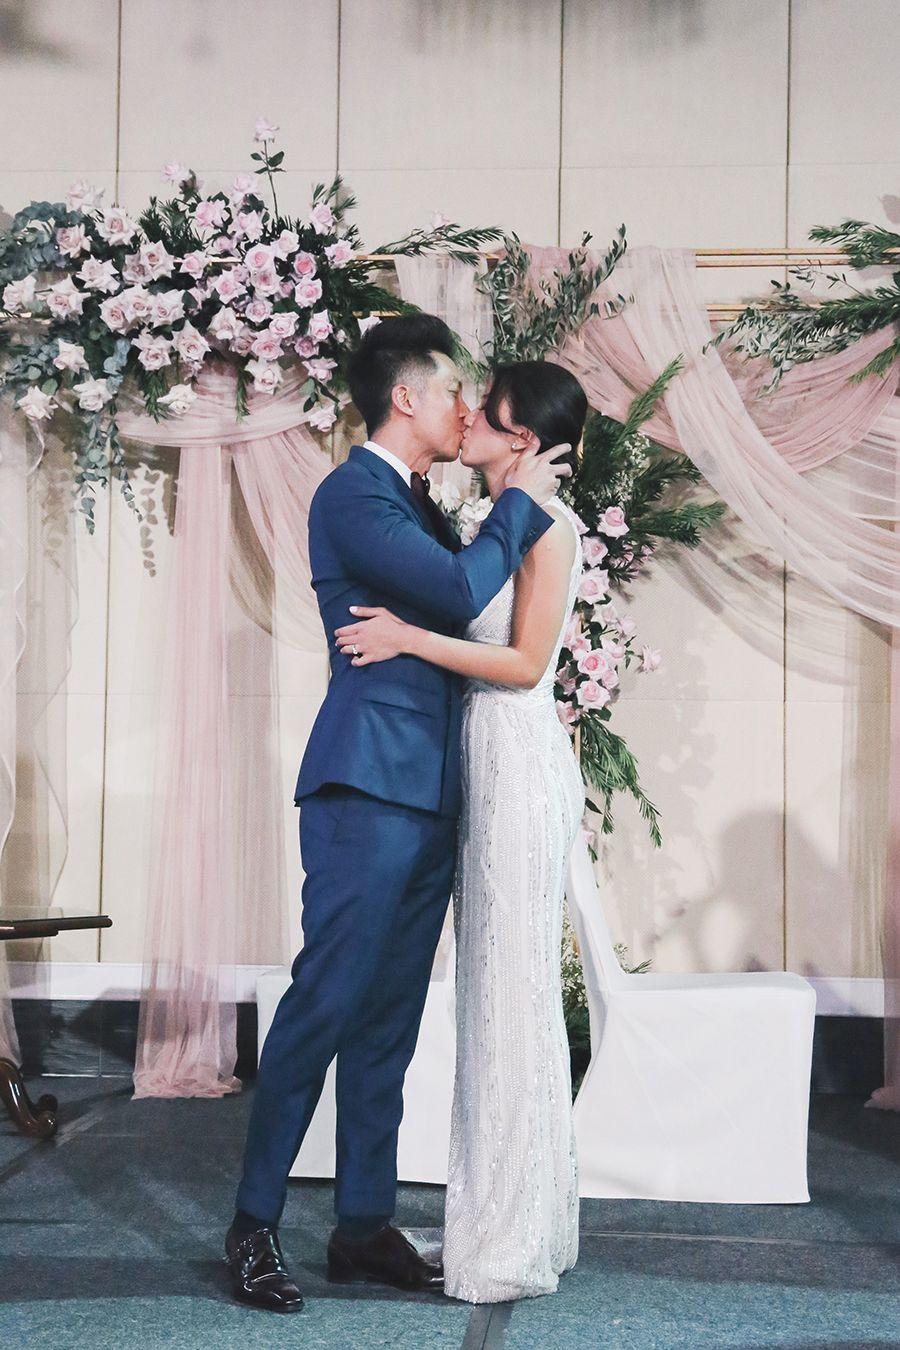 Love Bonito S Rachel Lim And Leonard Lee S Singapore Wedding At Intercontinental [ 1350 x 900 Pixel ]